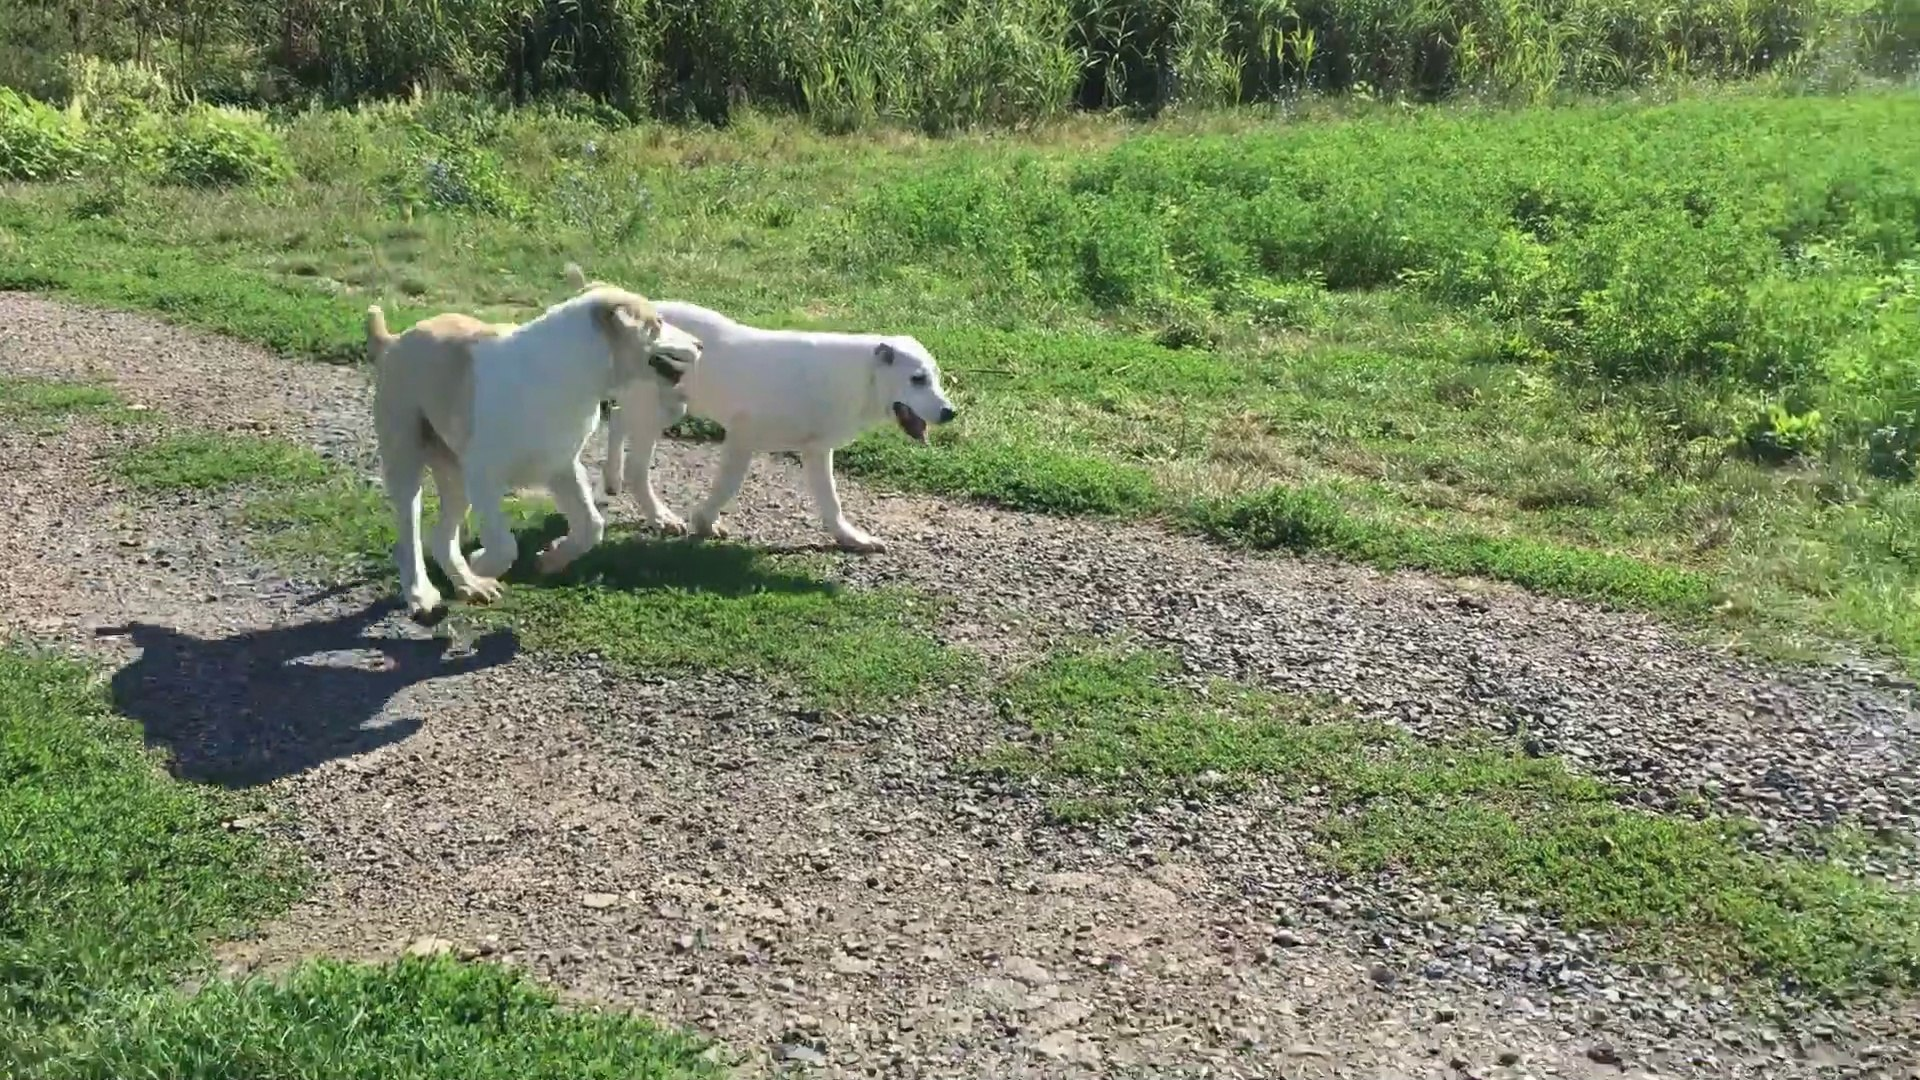 ALABAY COBAN KOPEGi YAVRULARI OGLEN GEZiNTiSi - ALABAi SHEPHERD DOG PUPPiES WALK